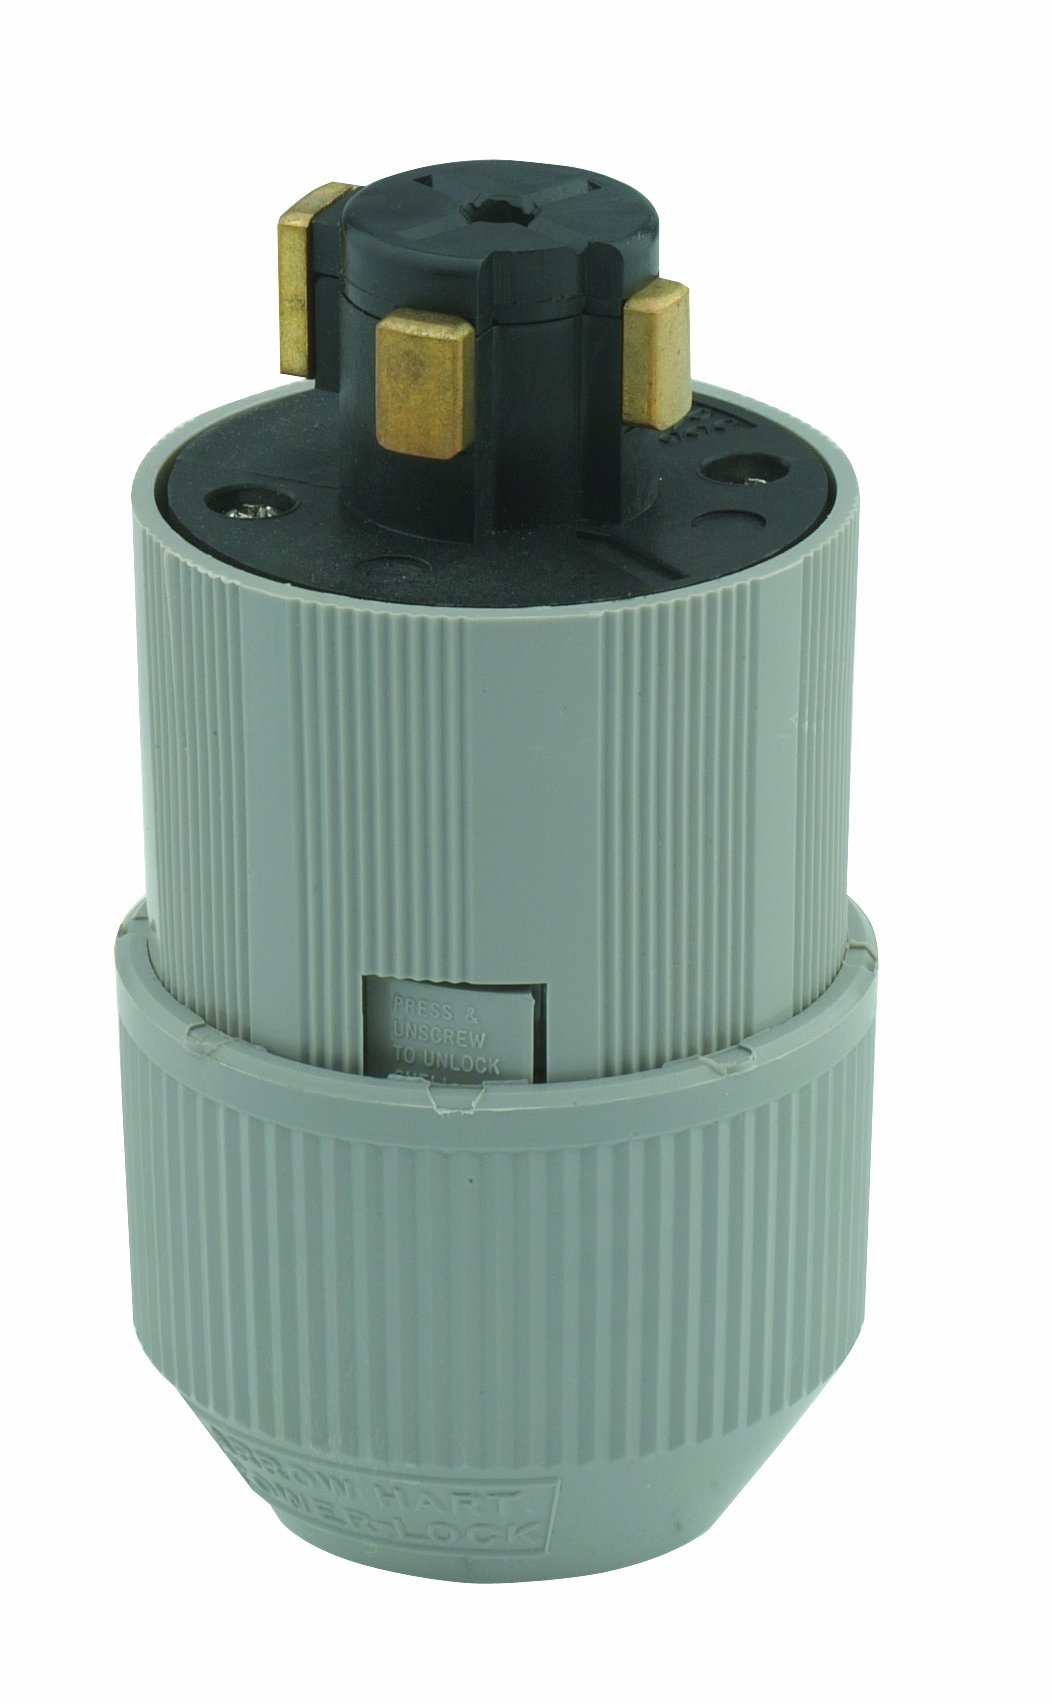 Leviton 21415-B 30 Amp, 600 Volt AC/20 Amp, 250 Volt DC 3-Pole 4-Wire Grounding, Locking Plug by Leviton (Image #1)